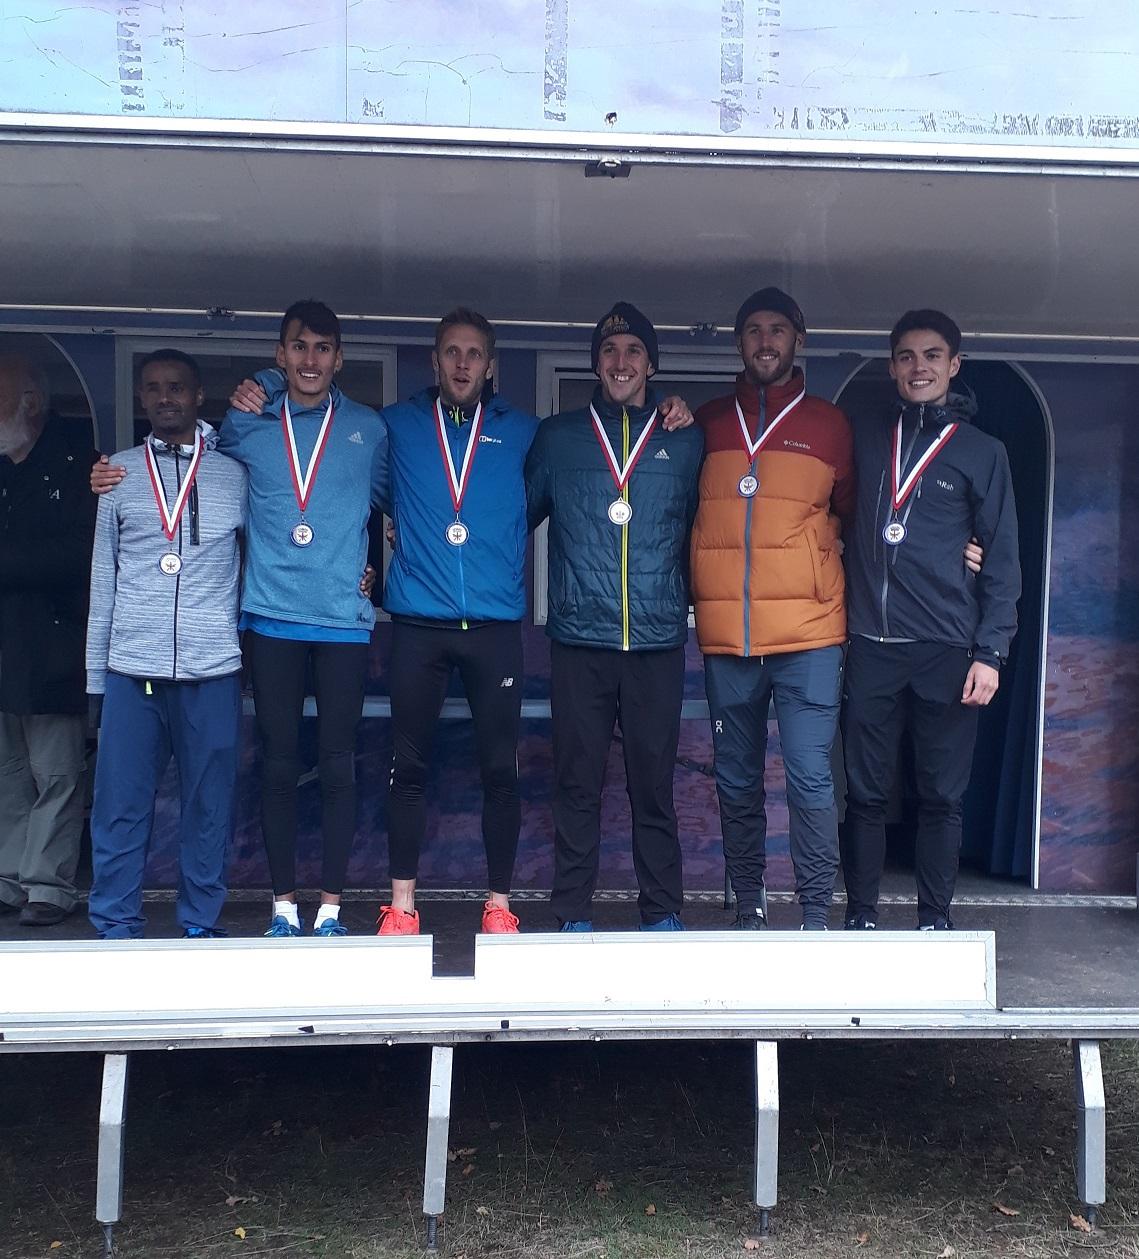 Silver medals for Leeds City Men